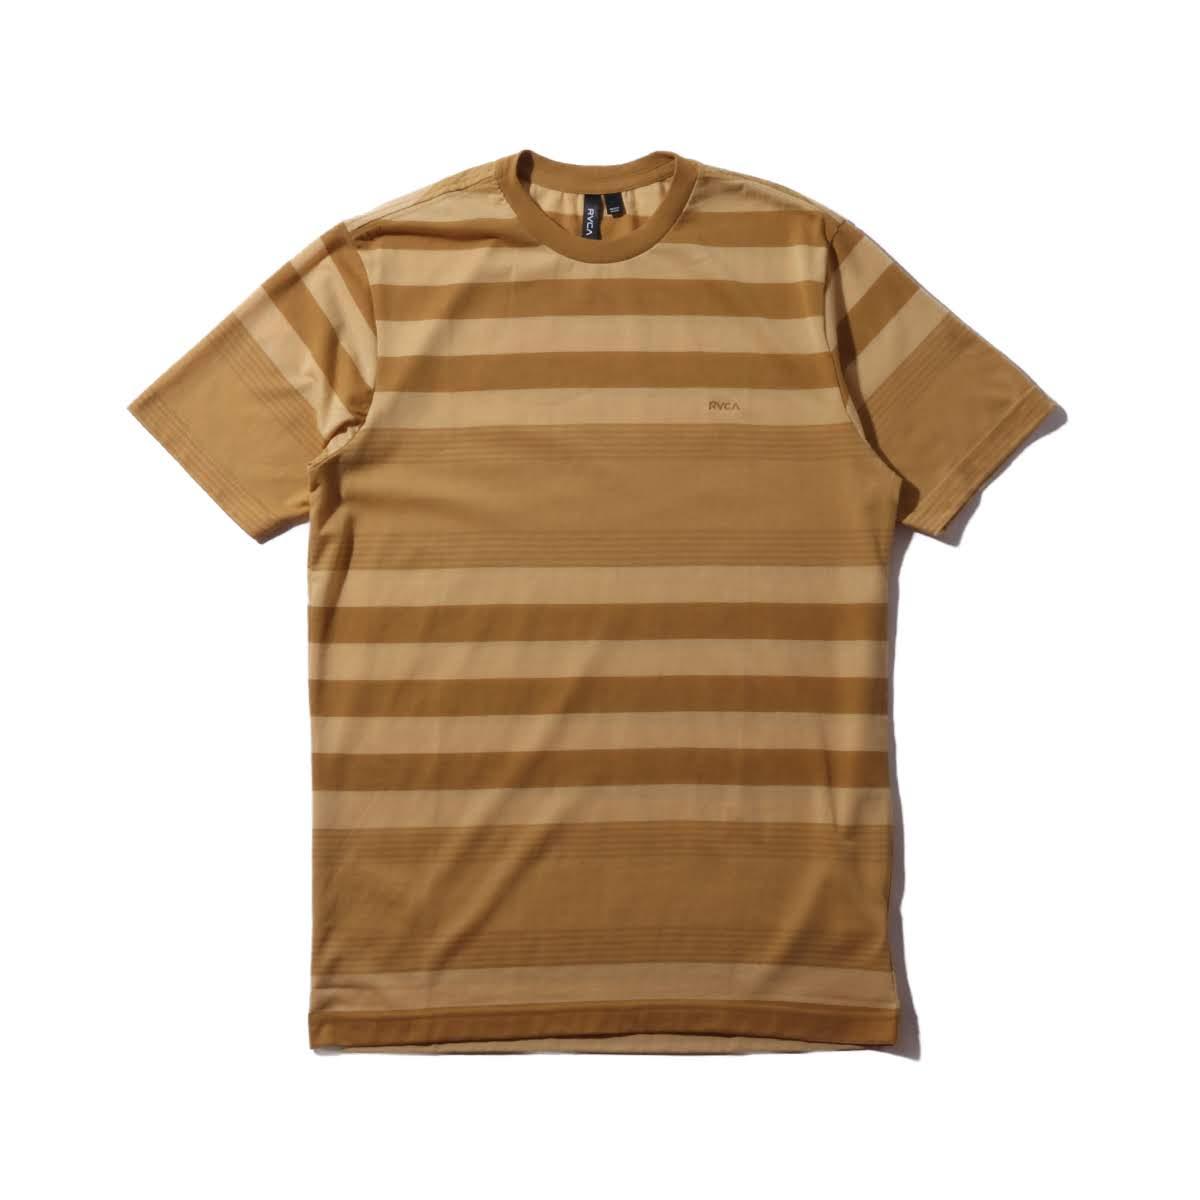 RVCA KONA CREW S/S KNIT TEE(ルーカ ショート スリーブ ティーシャツ)2色展開【メンズ 半袖Tシャツ】